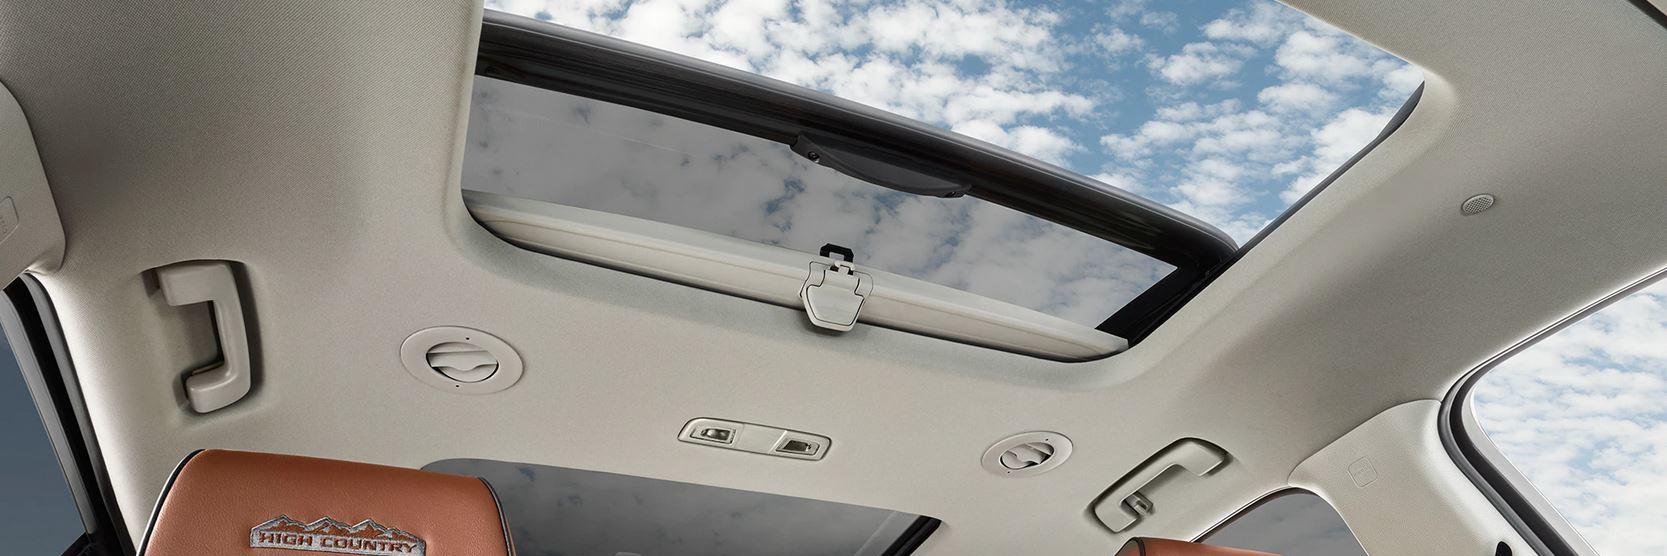 2020 Chevrolet Traverse Sunroof